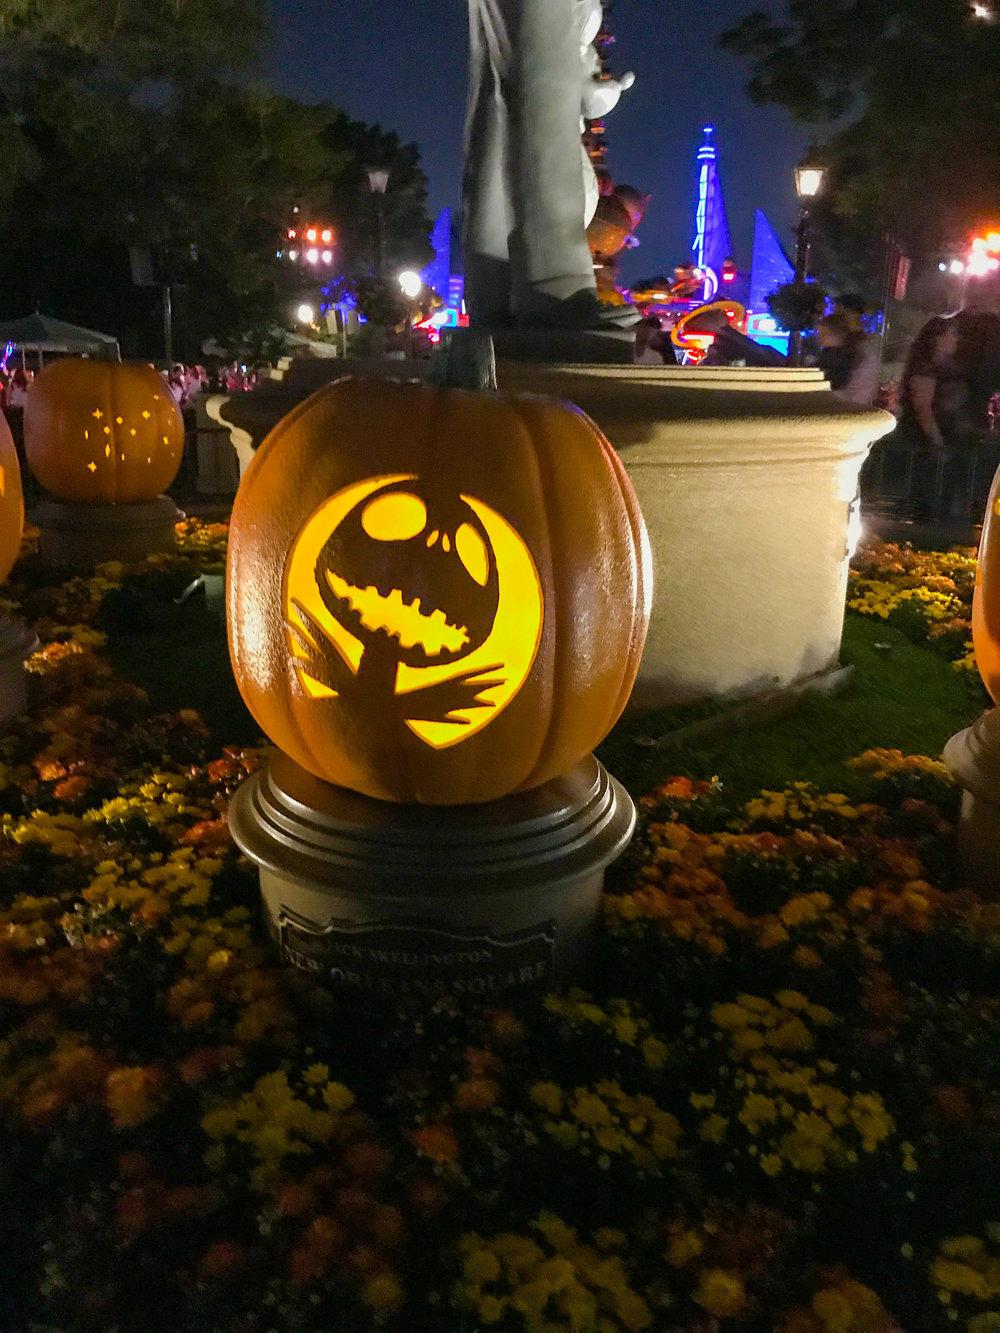 jack_skellington_Pumpkin_Disneyland_Halloween_2017-54.jpg